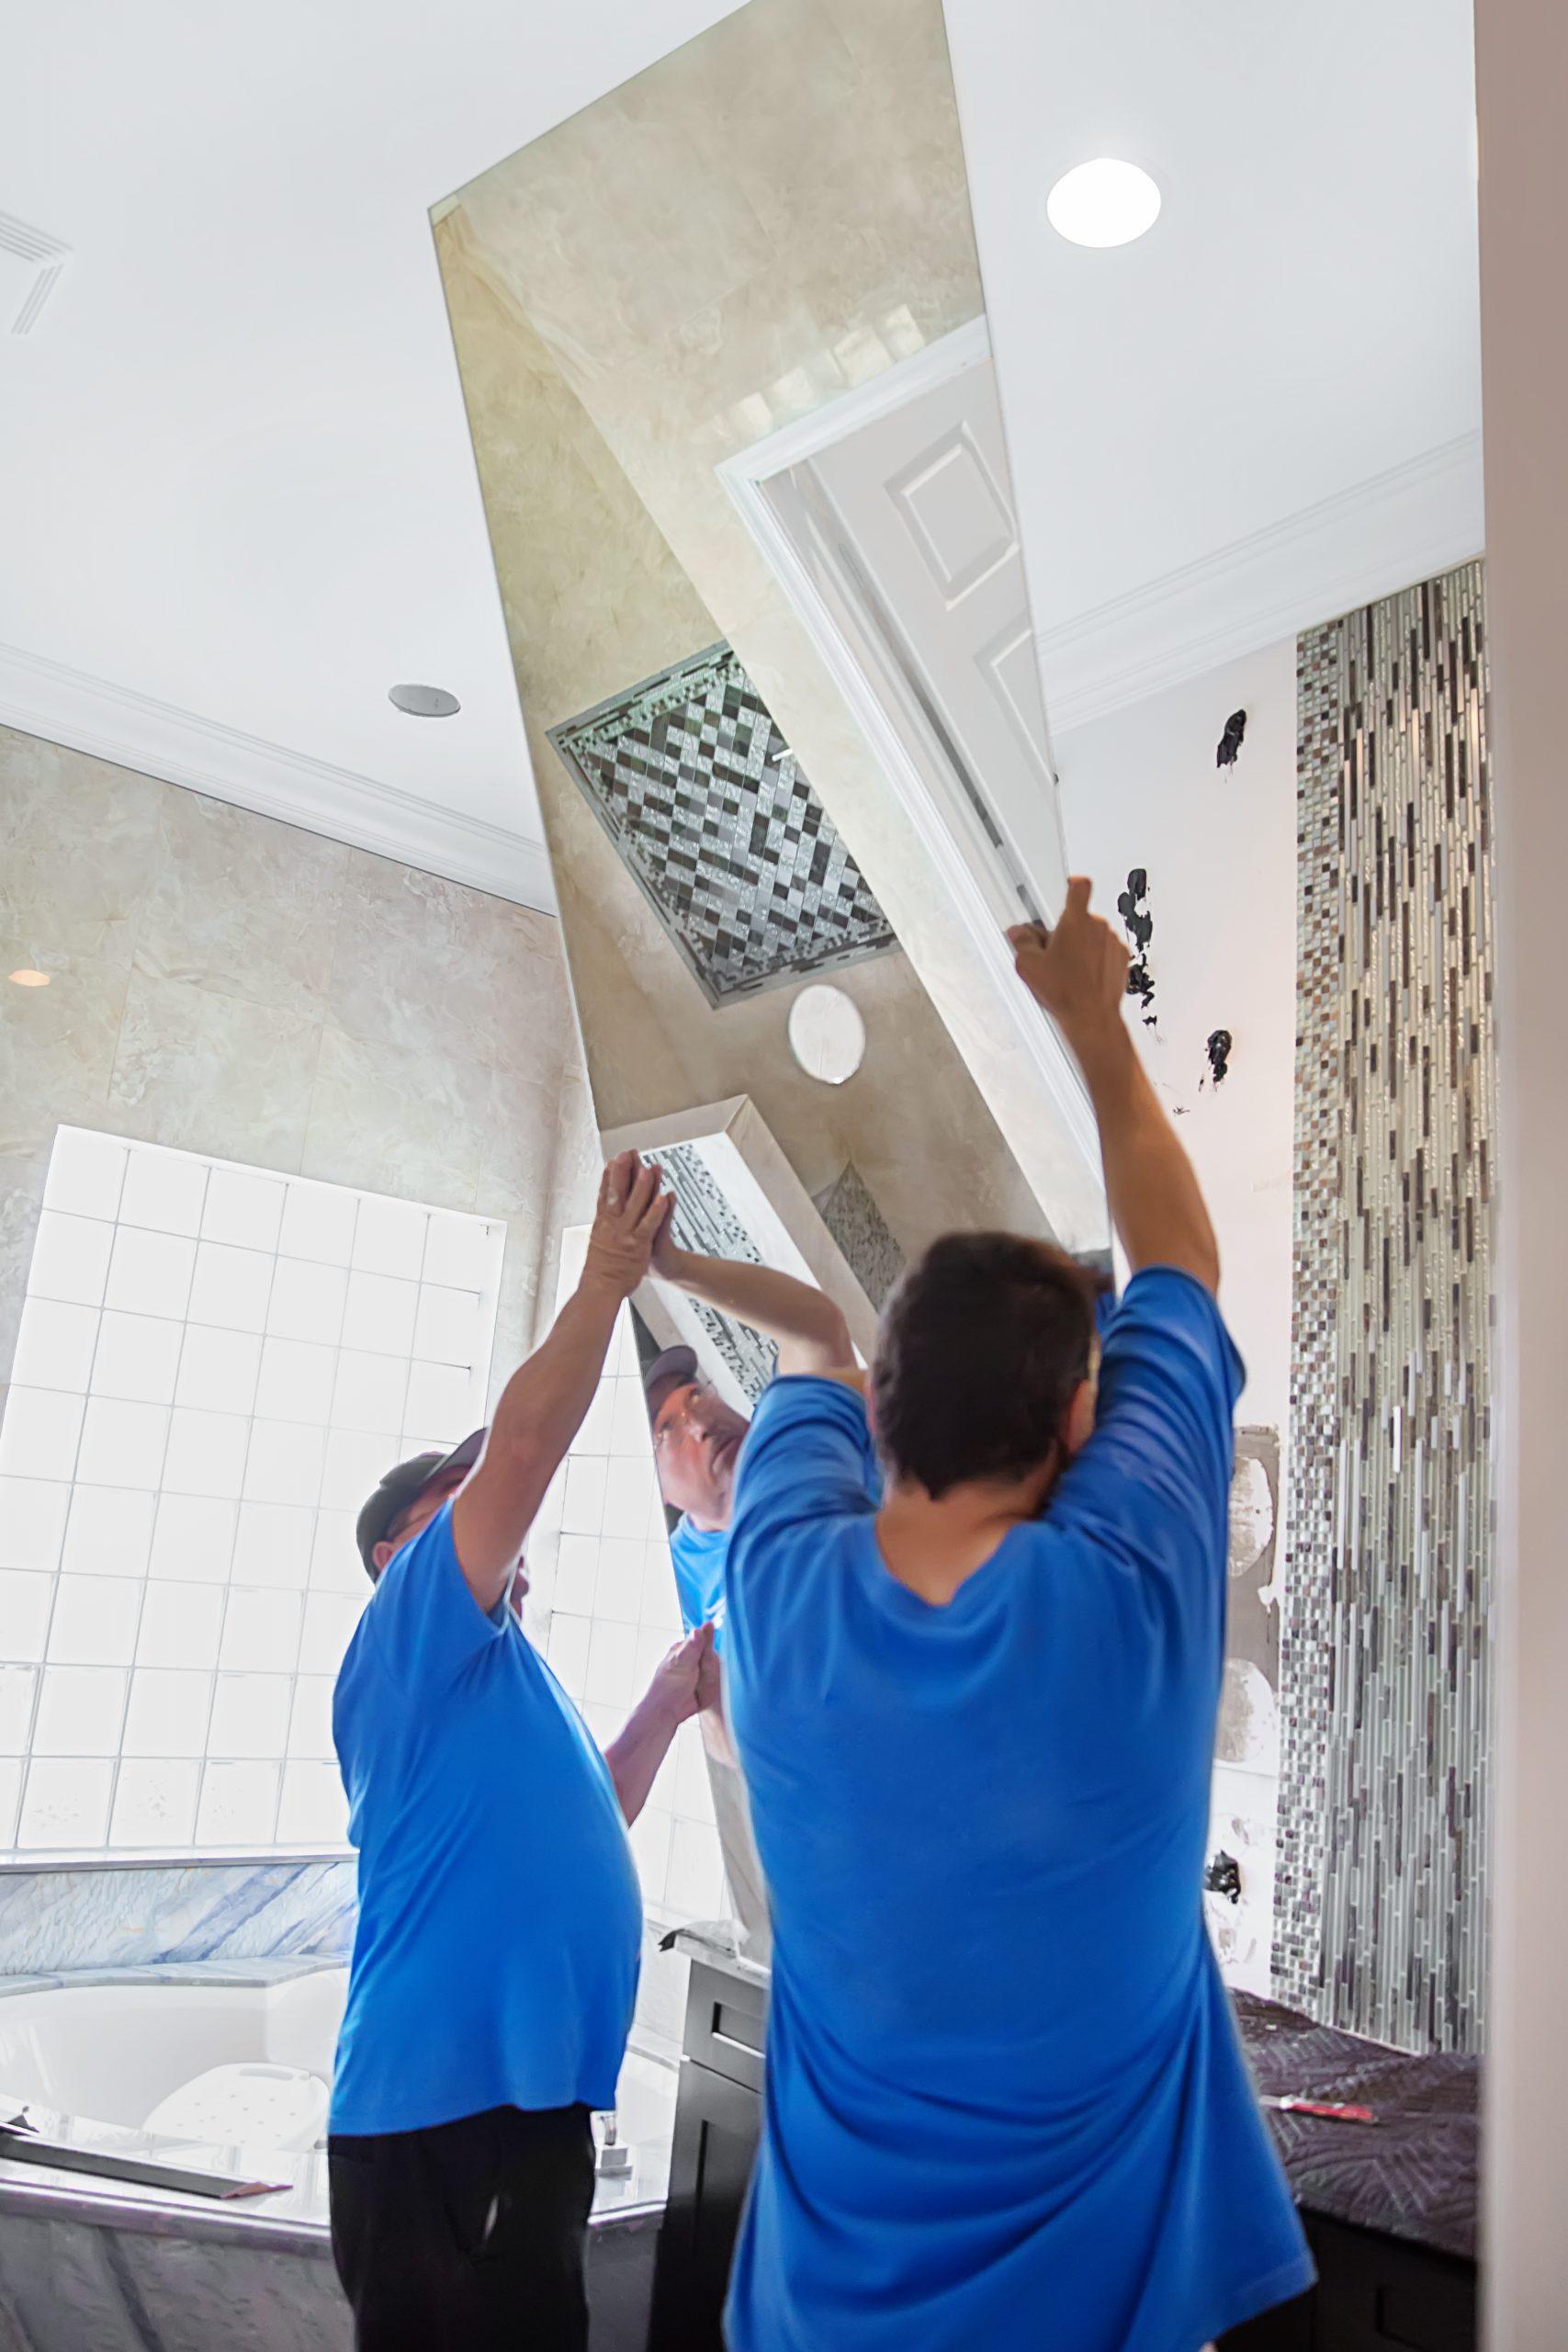 Workers installing bathroom mirror